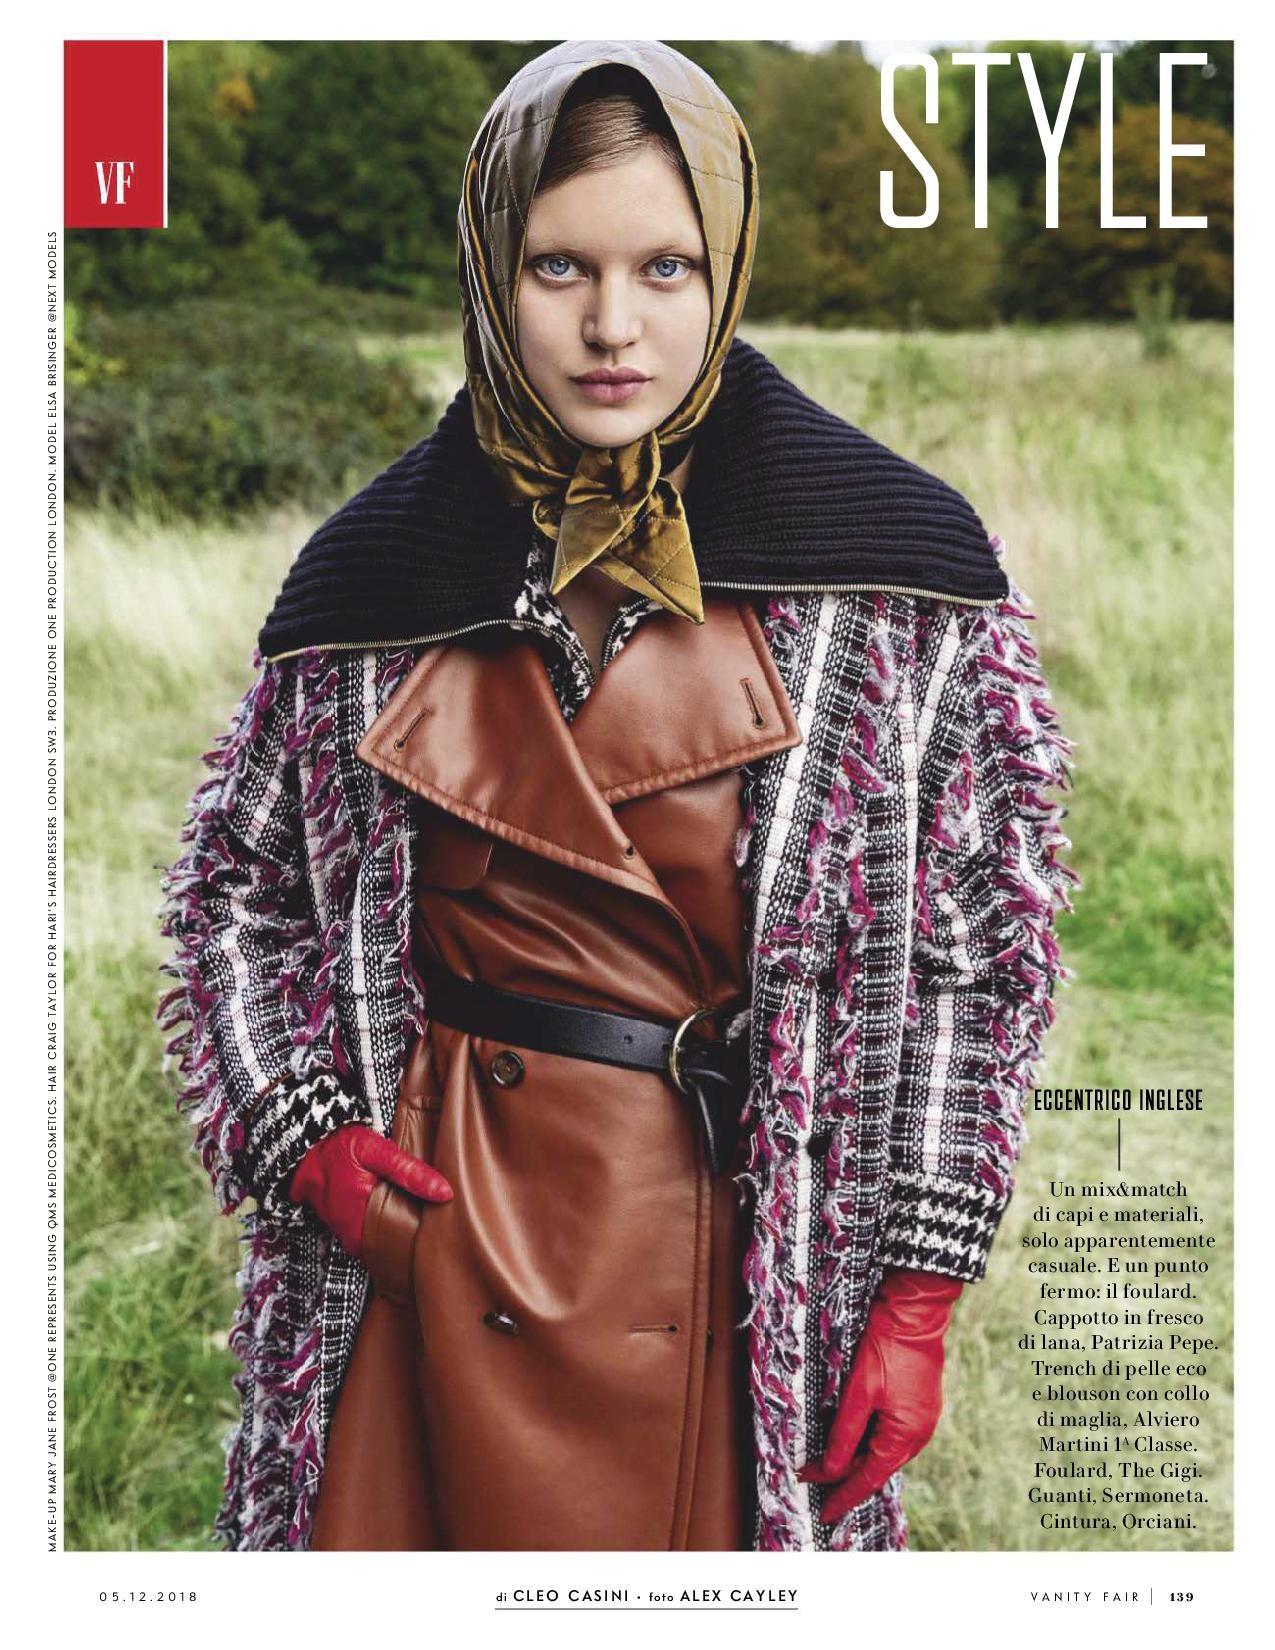 Elsa Brisinger Page 2 Female Fashion Models Bellazon